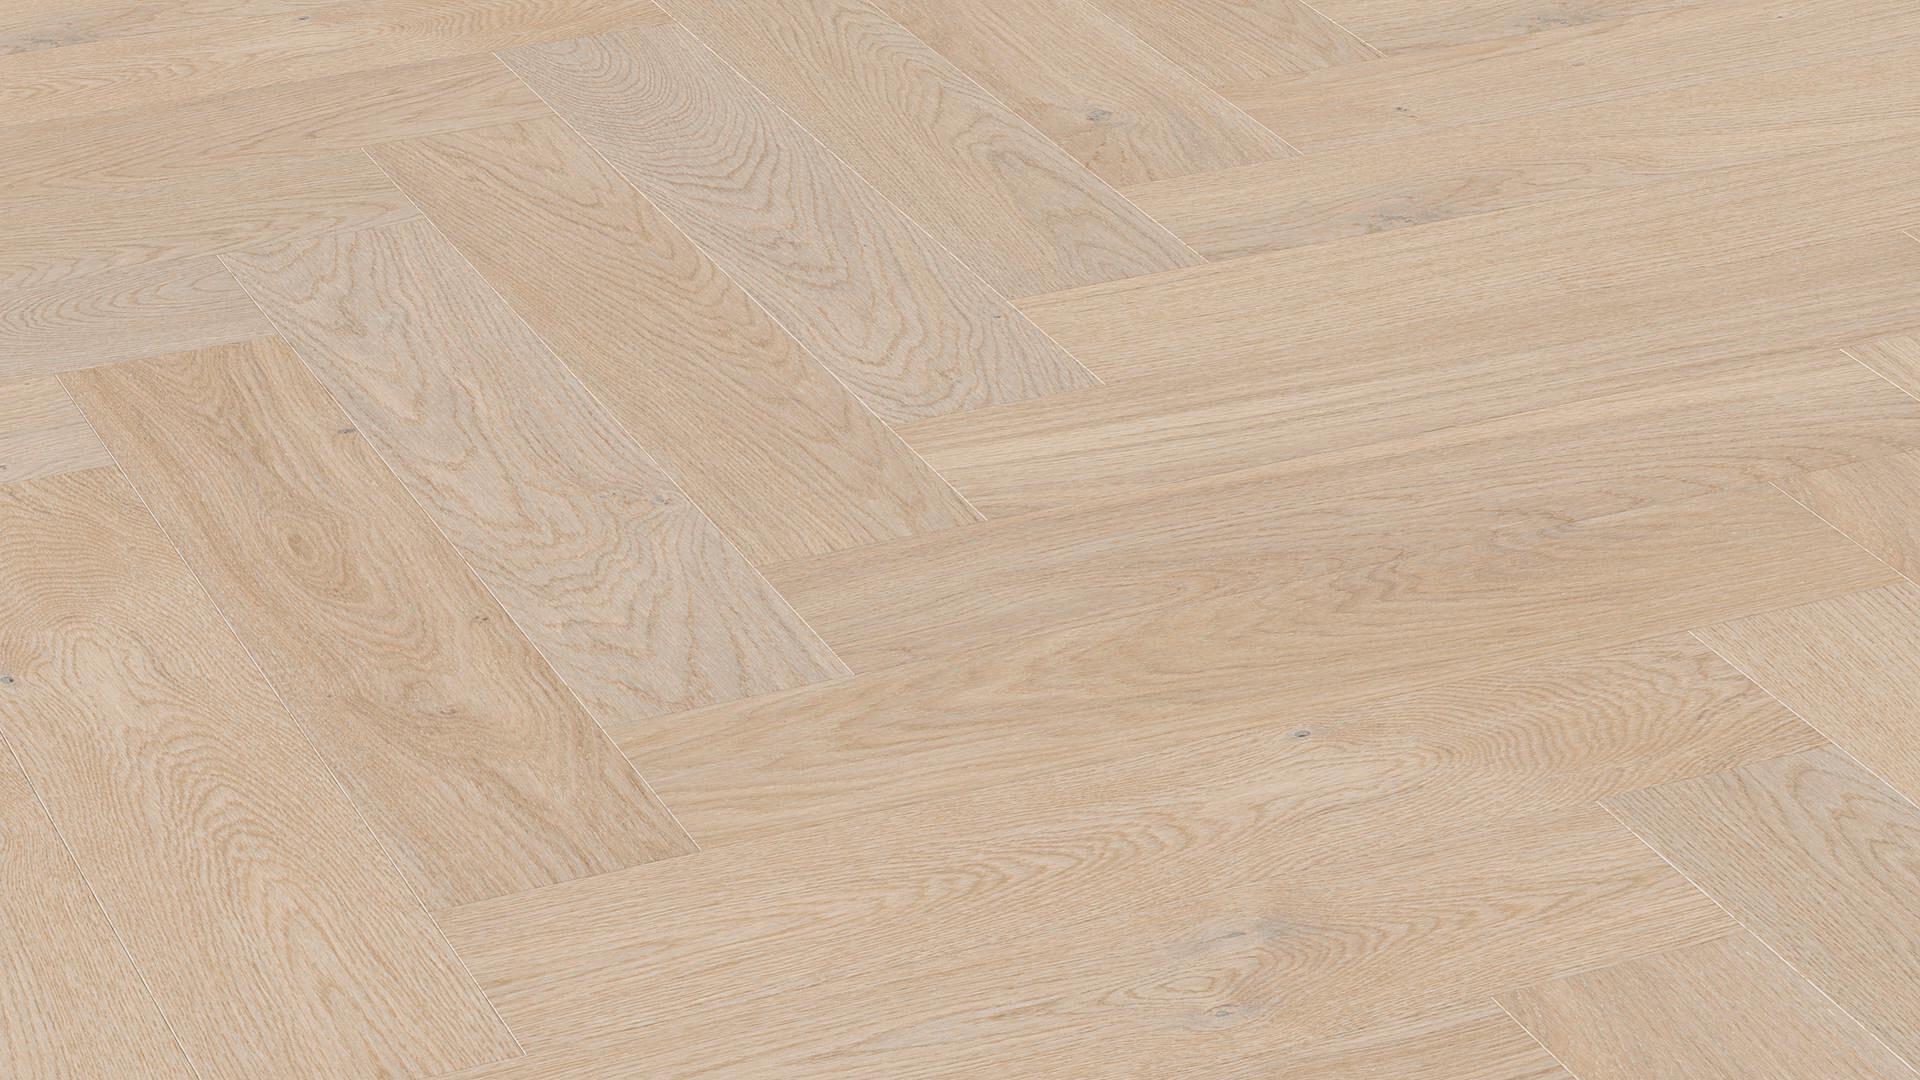 Parquet flooring MeisterParquet. longlife PS 500 Pearl oak harmonious 8816